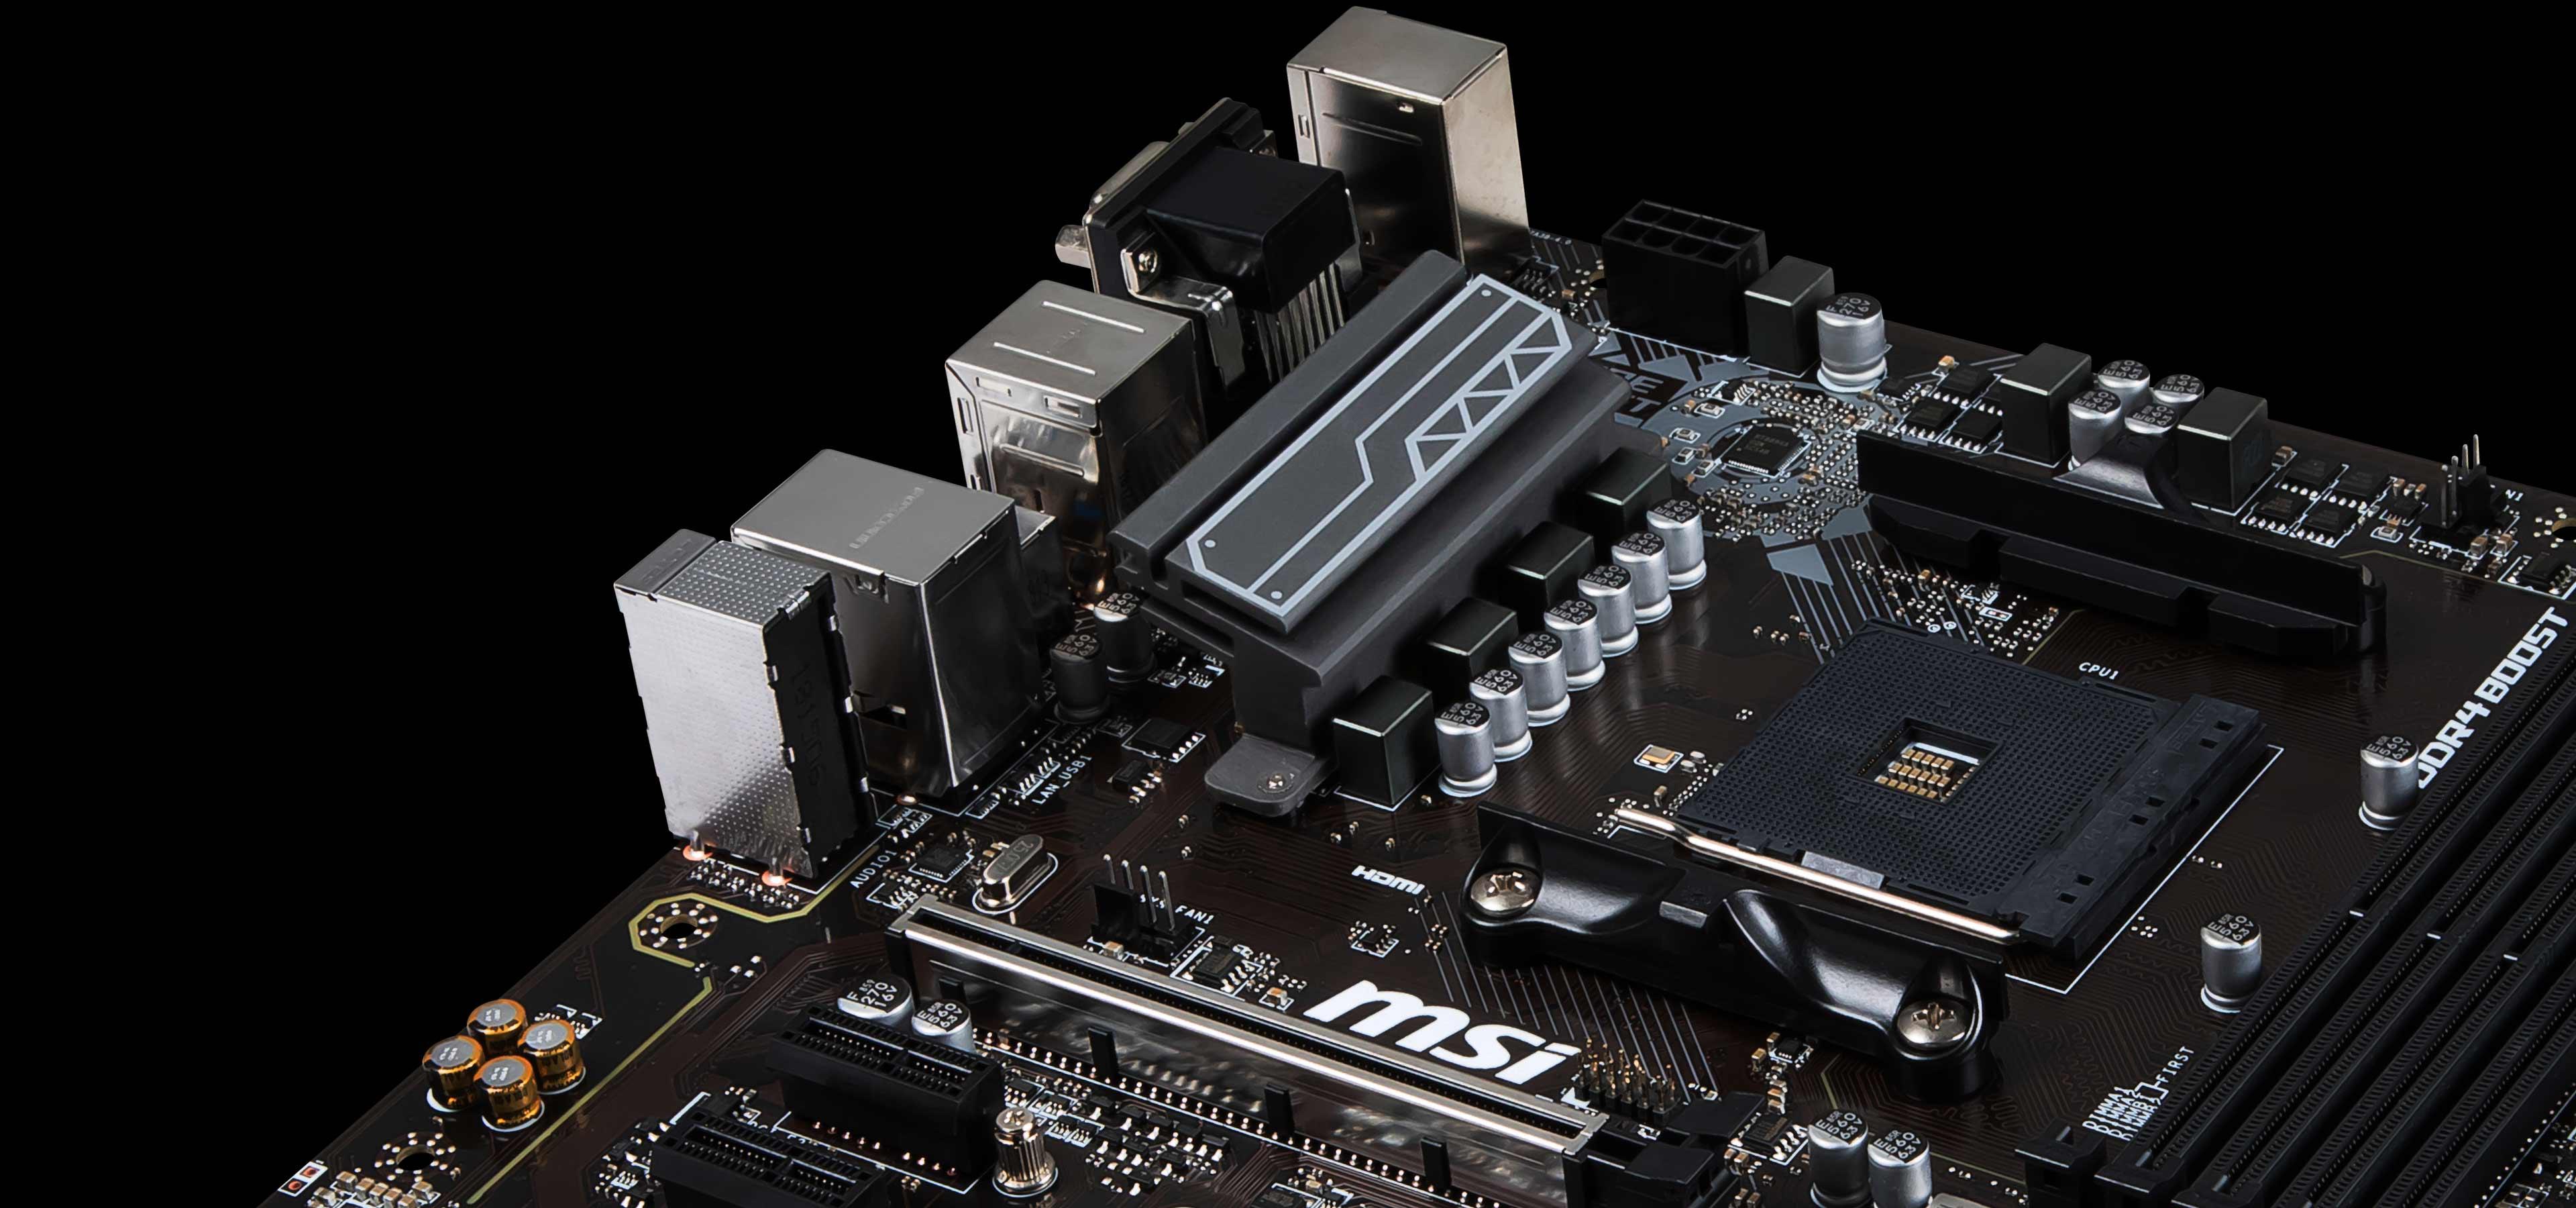 B450M PRO-VDH | Motherboard - The world leader in motherboard design